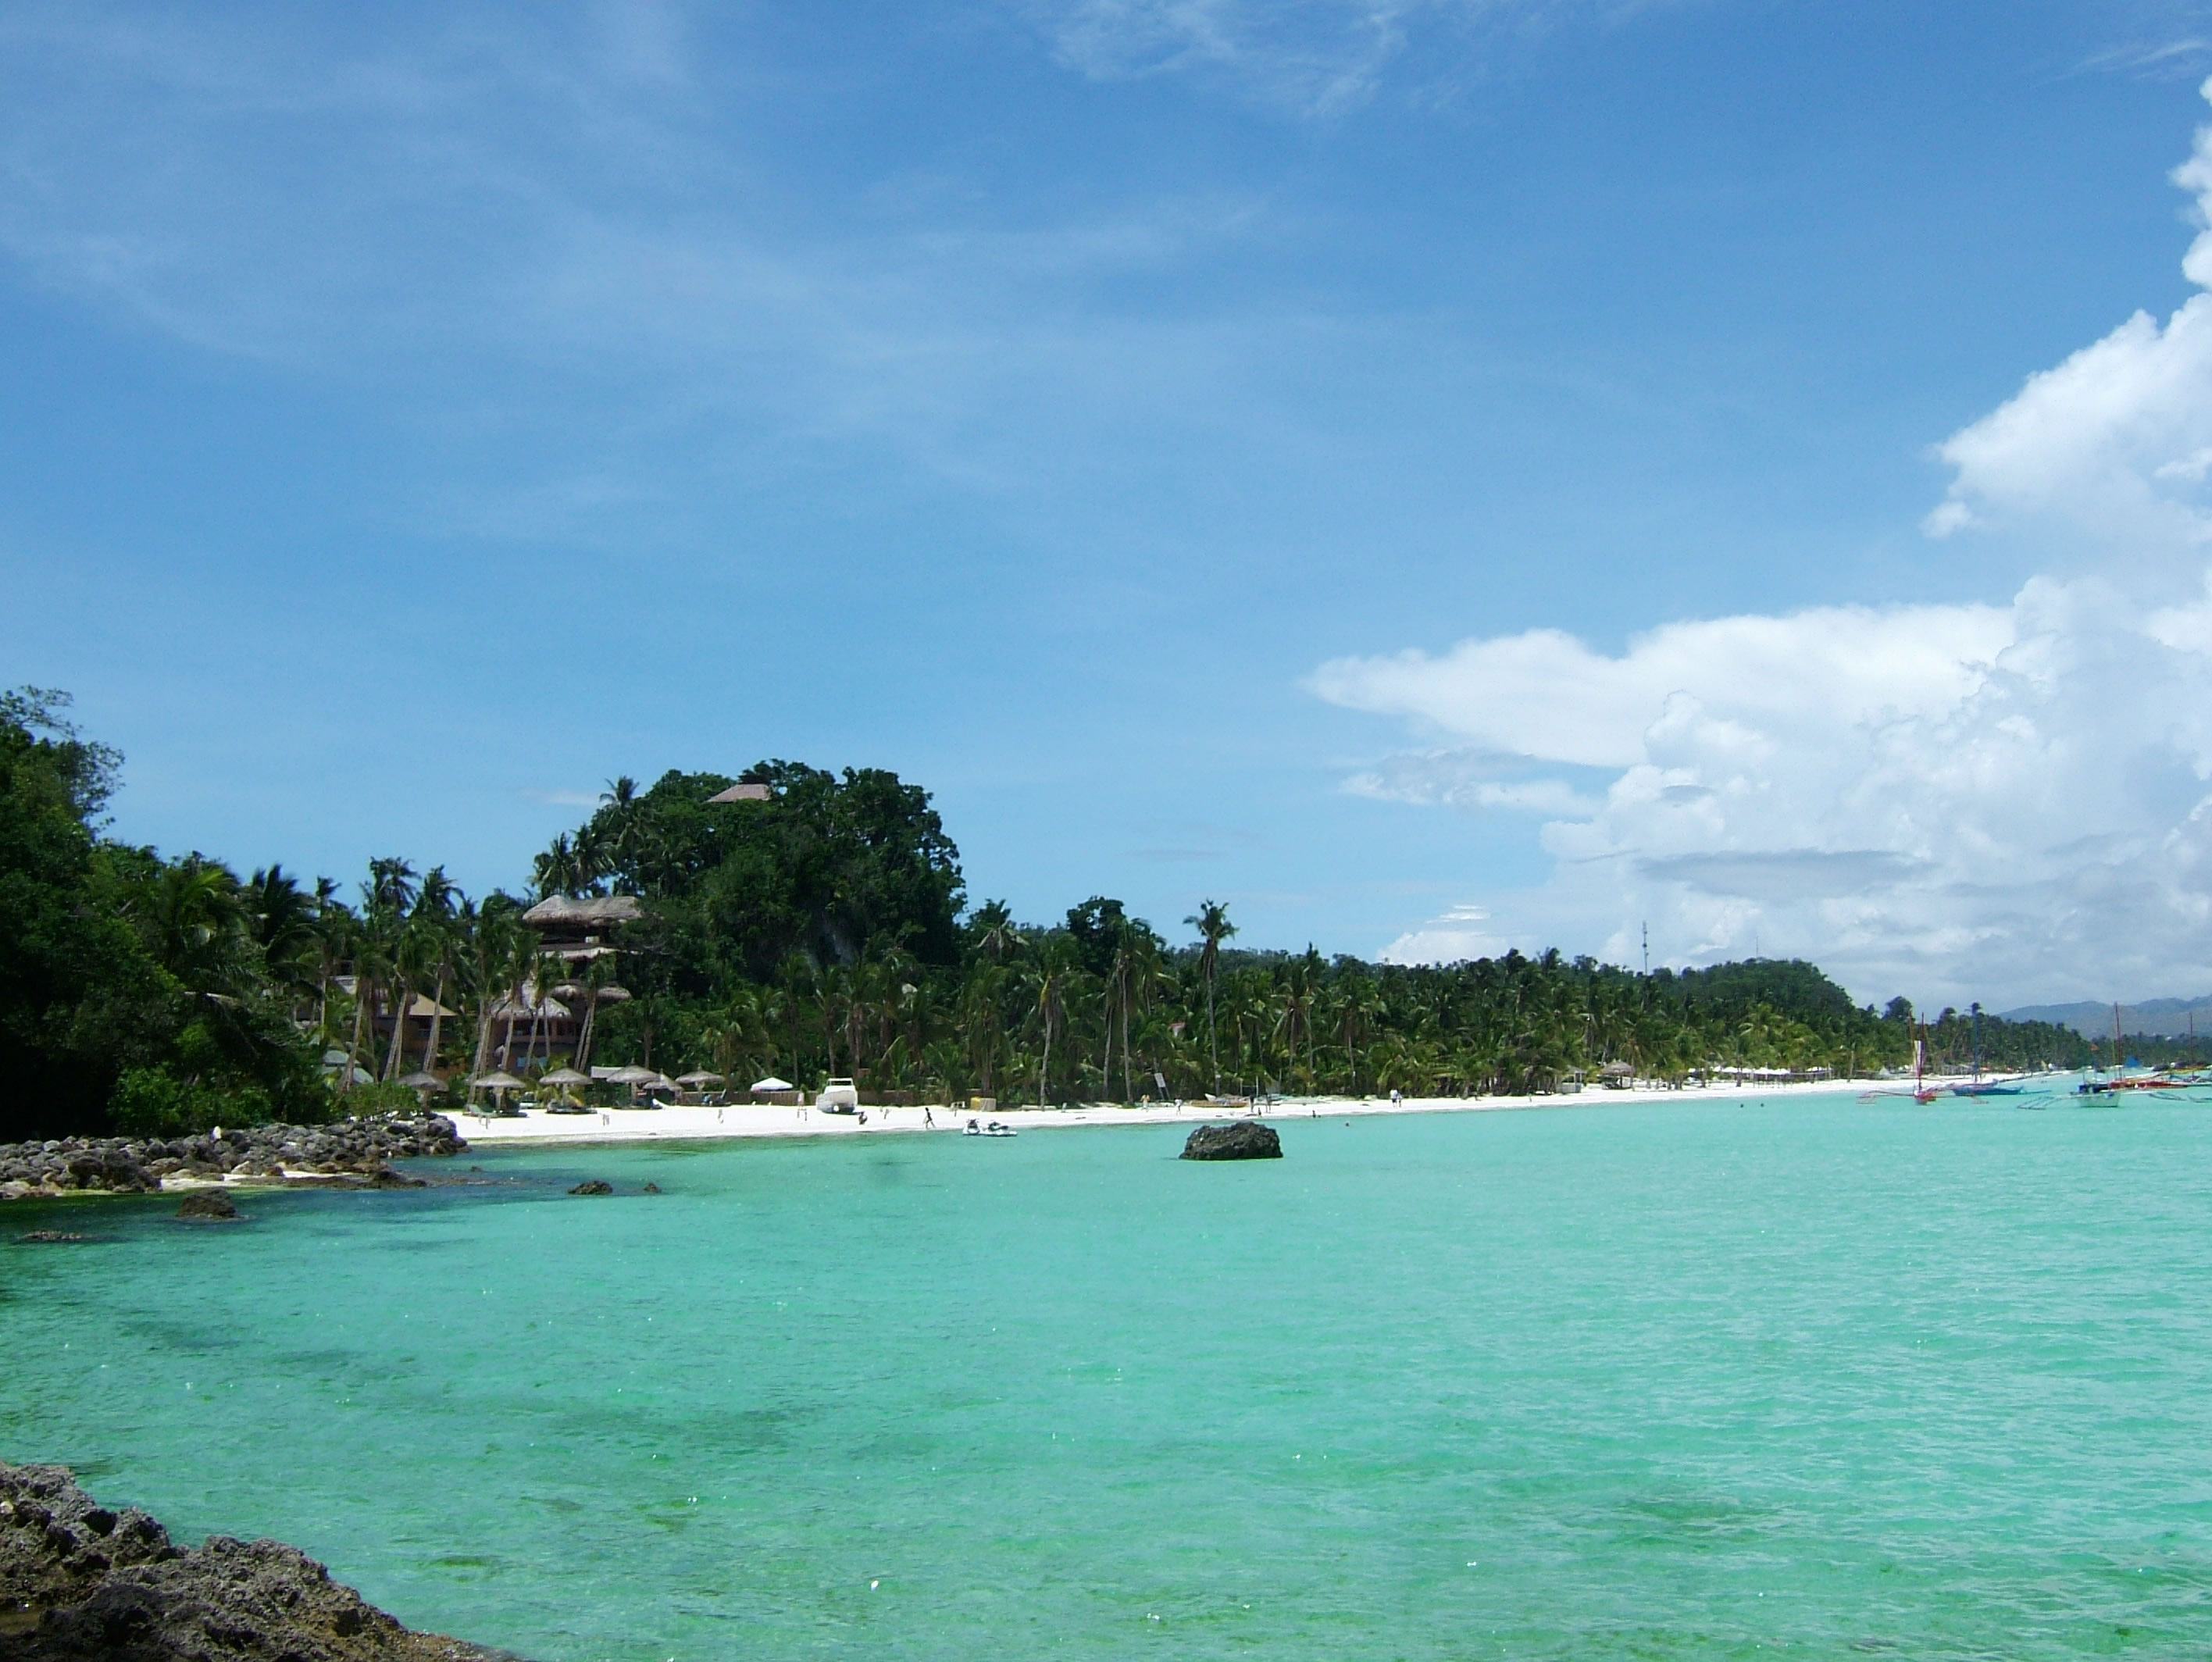 Philippines Sugar Islands Boracay Punta bunga beach Resorts 2007 16